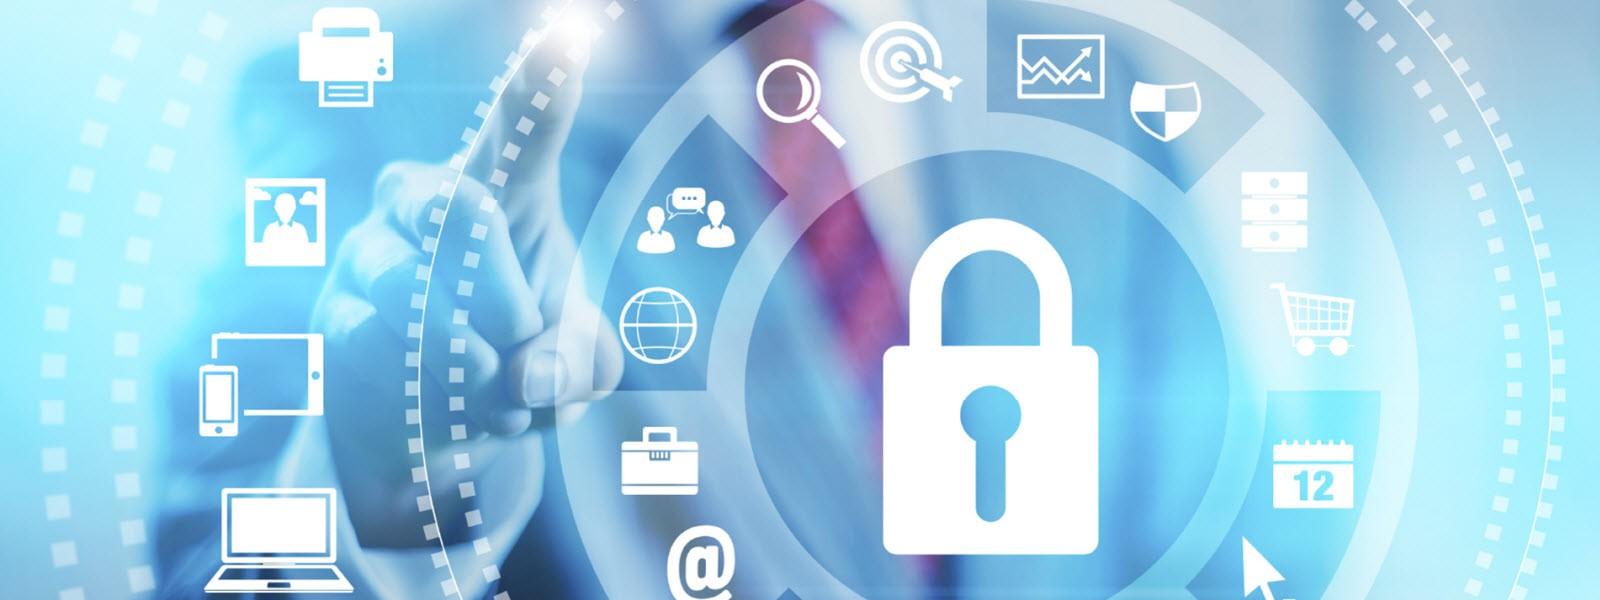 Computer Market Research's PartnerPortal Platform Features